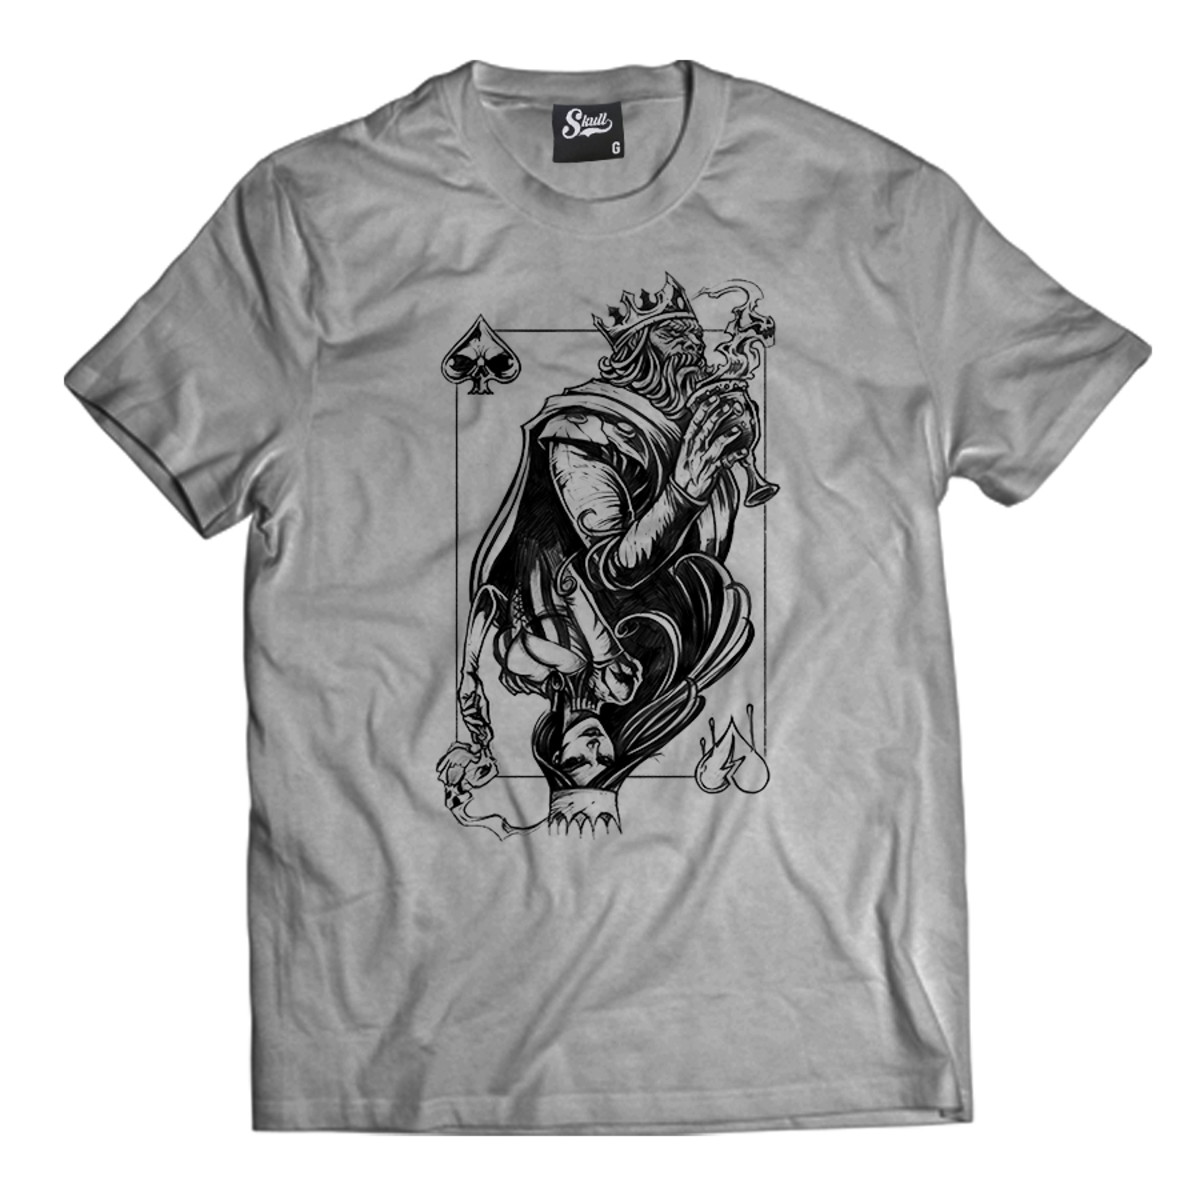 69d5276ec Camiseta Rei e Rainha Naipes Camisa Masculina Carta Top Swag no Elo7 ...